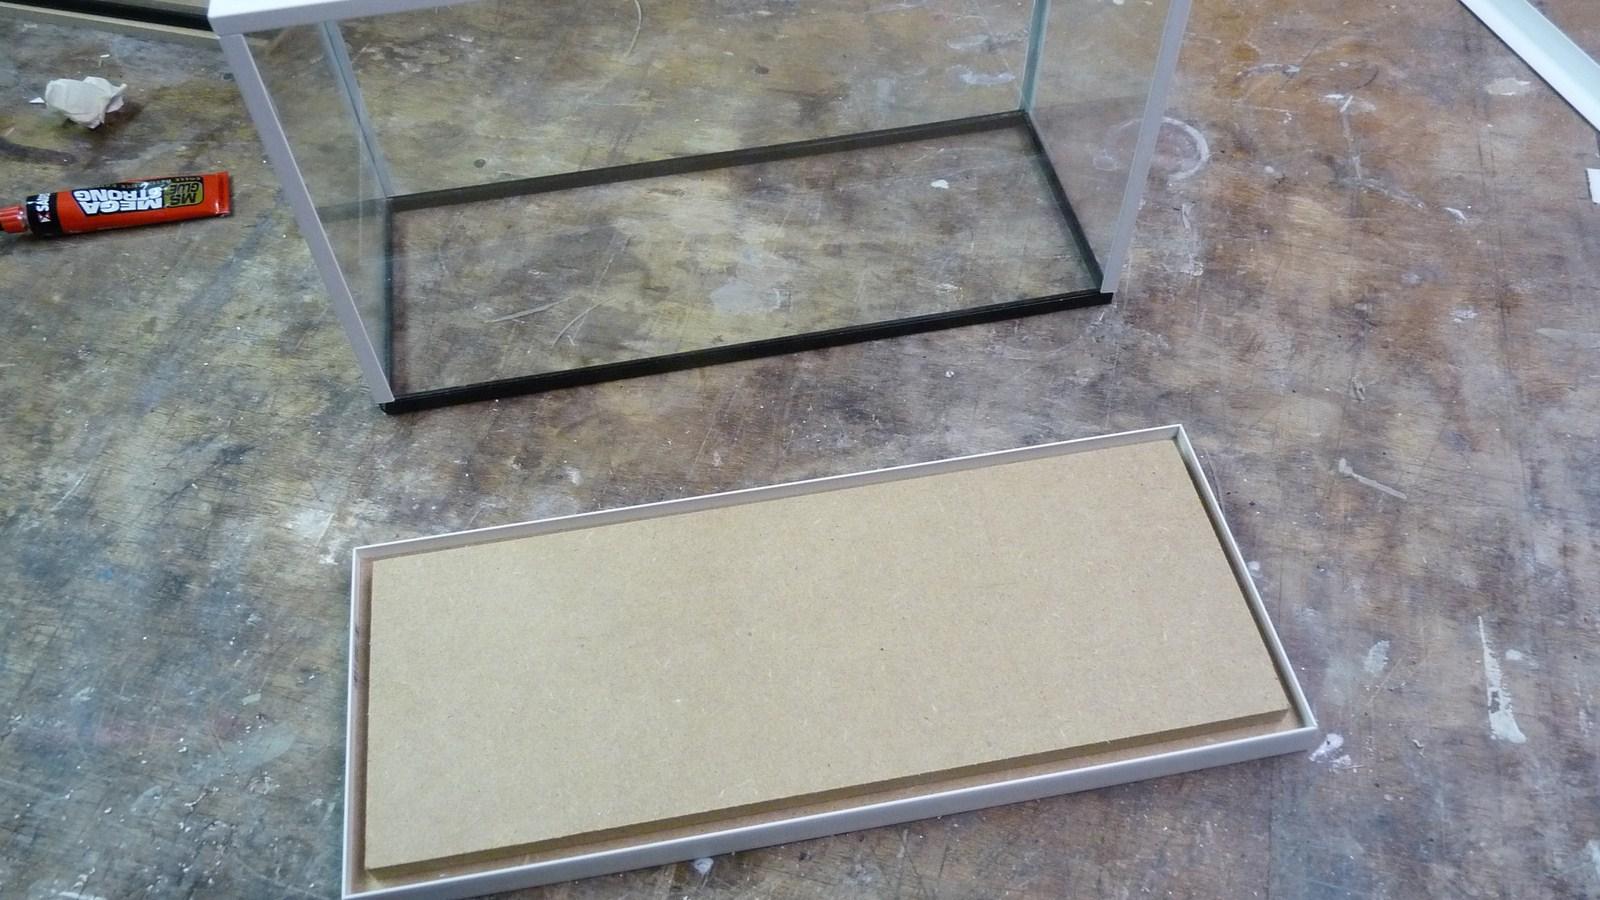 Fabriquer ses propres vitrines en verre 17071907271423134915156559